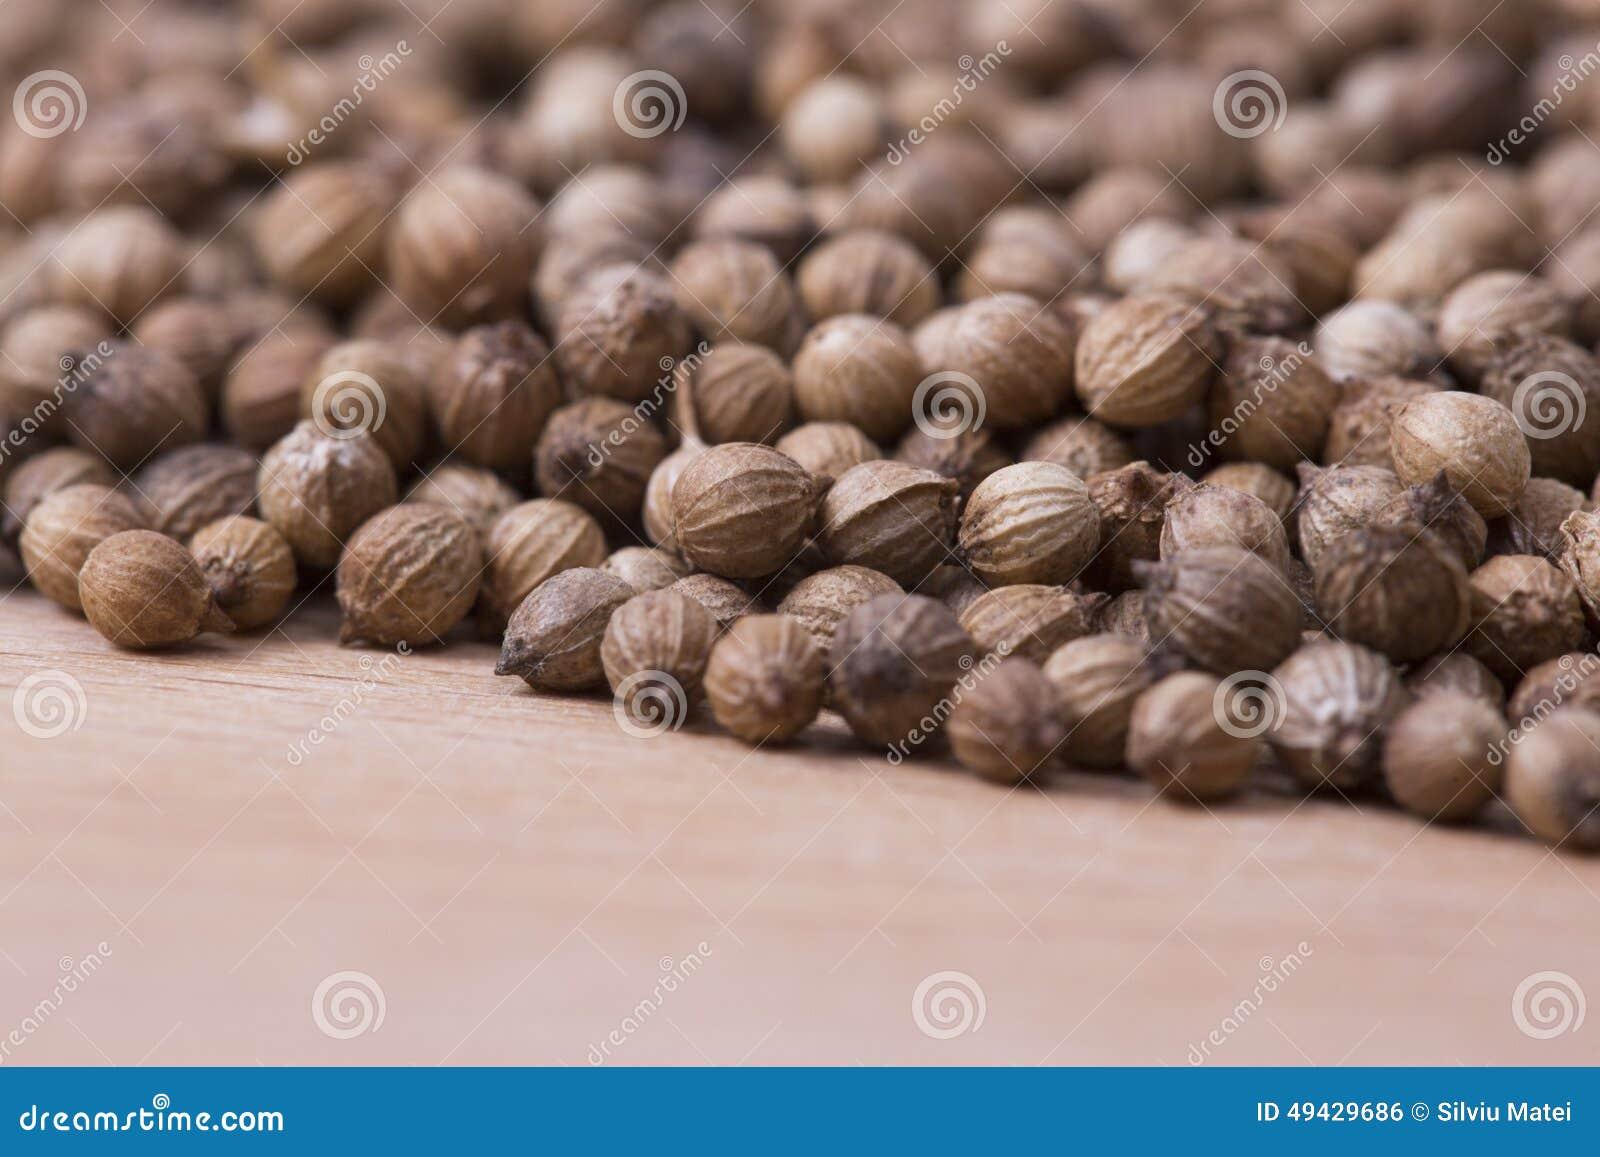 Coriander seeds closeup